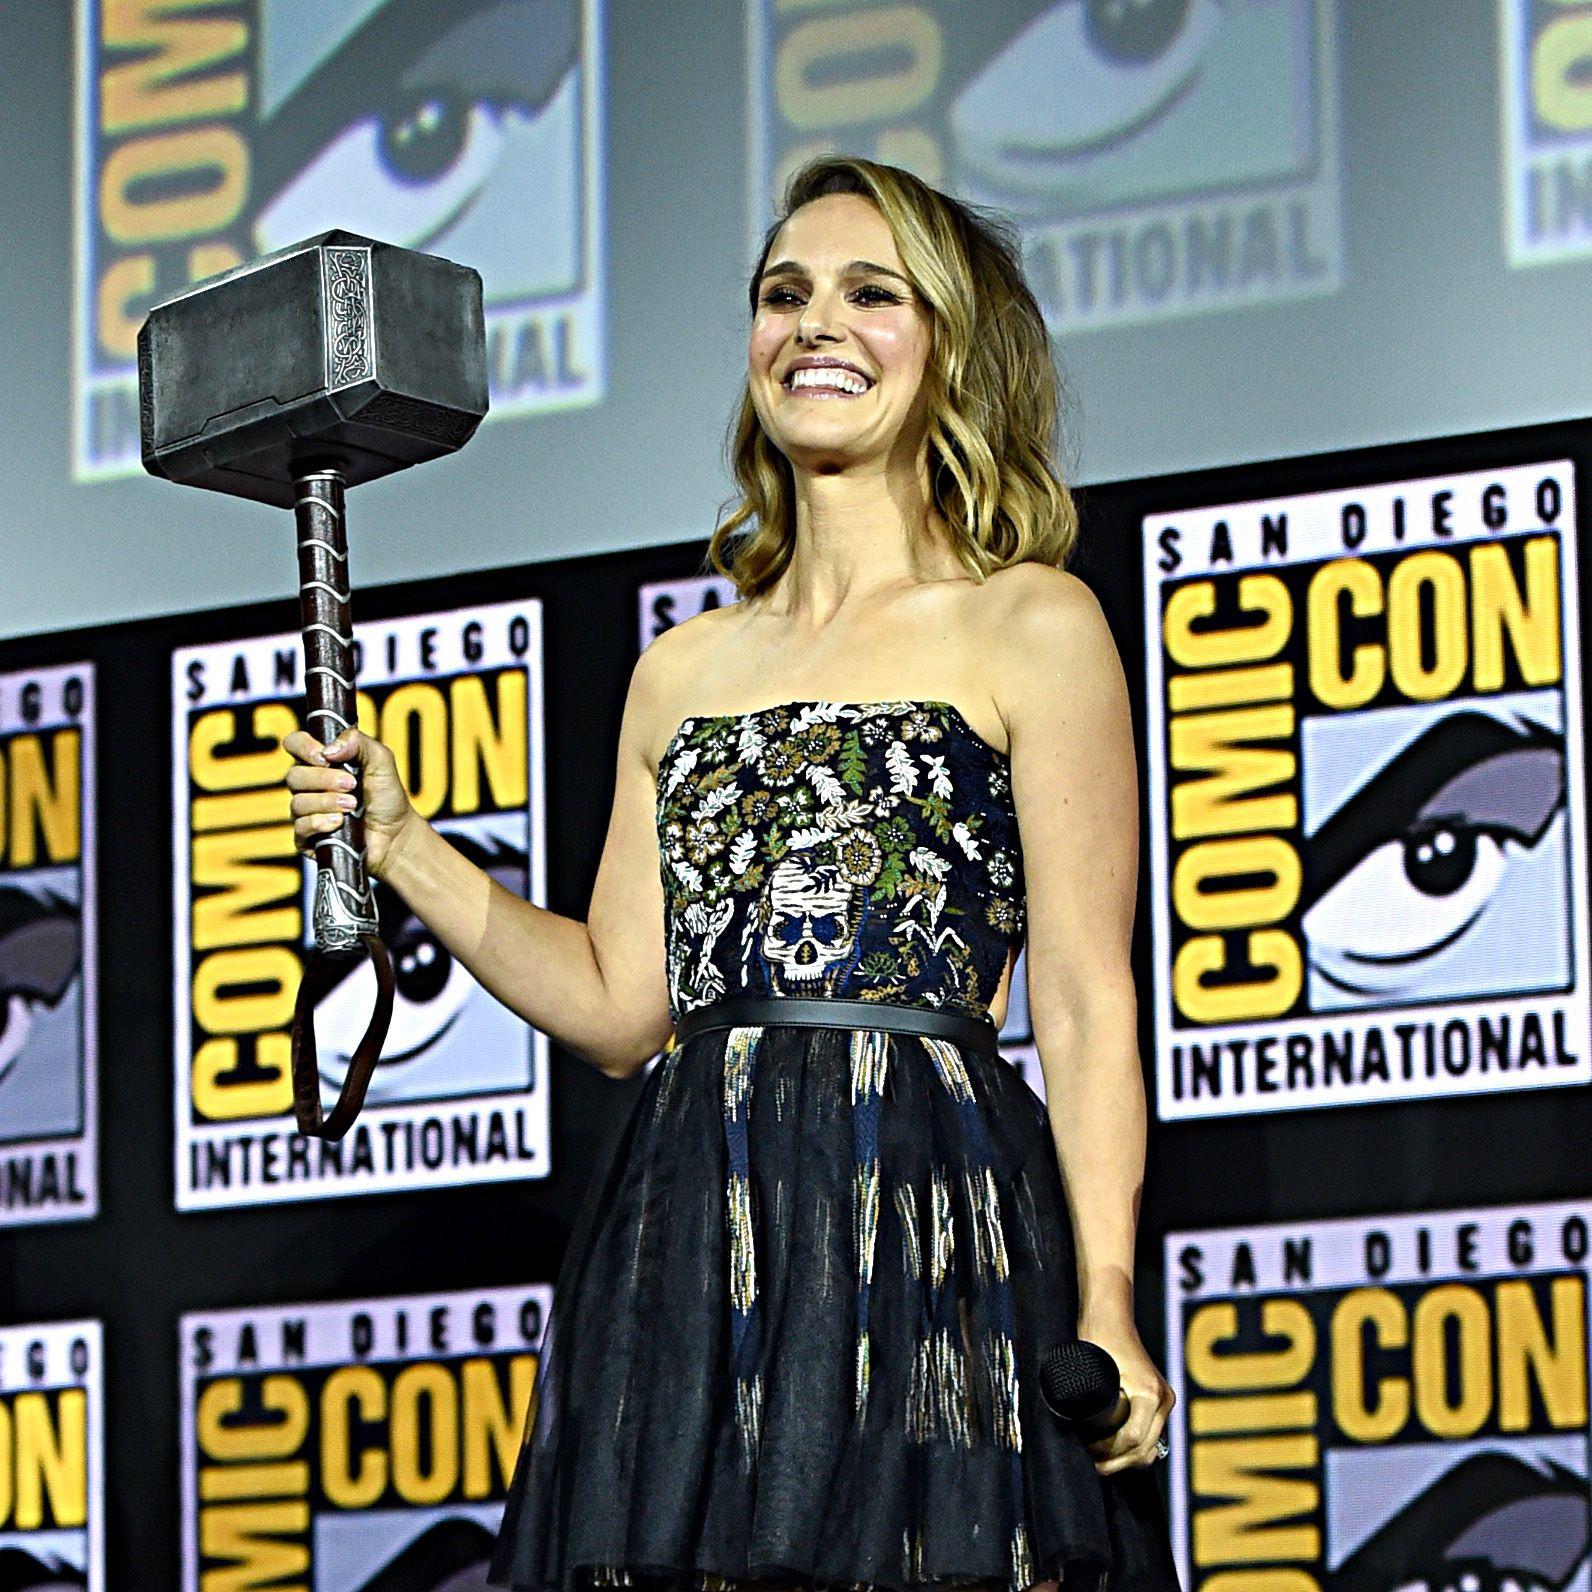 Natalie Portman Will Be the 'Goddess of Thunder' in Marvel's Phase Four 'Thor' Movie